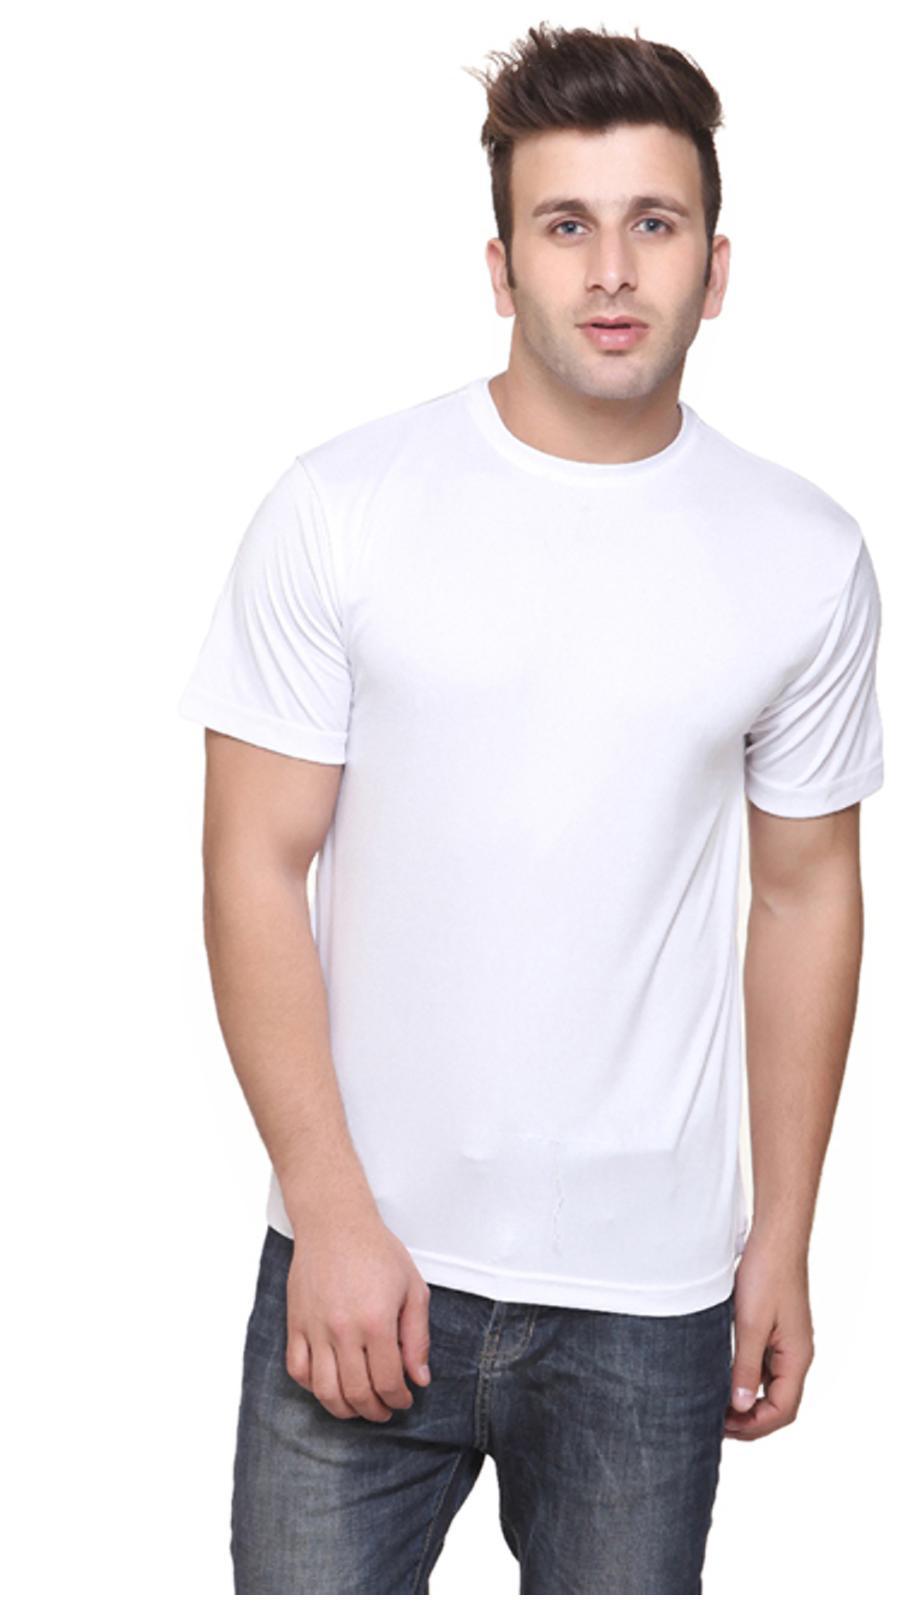 KETEX WHITE ROUND NECK DRI FIT T-SHIRT